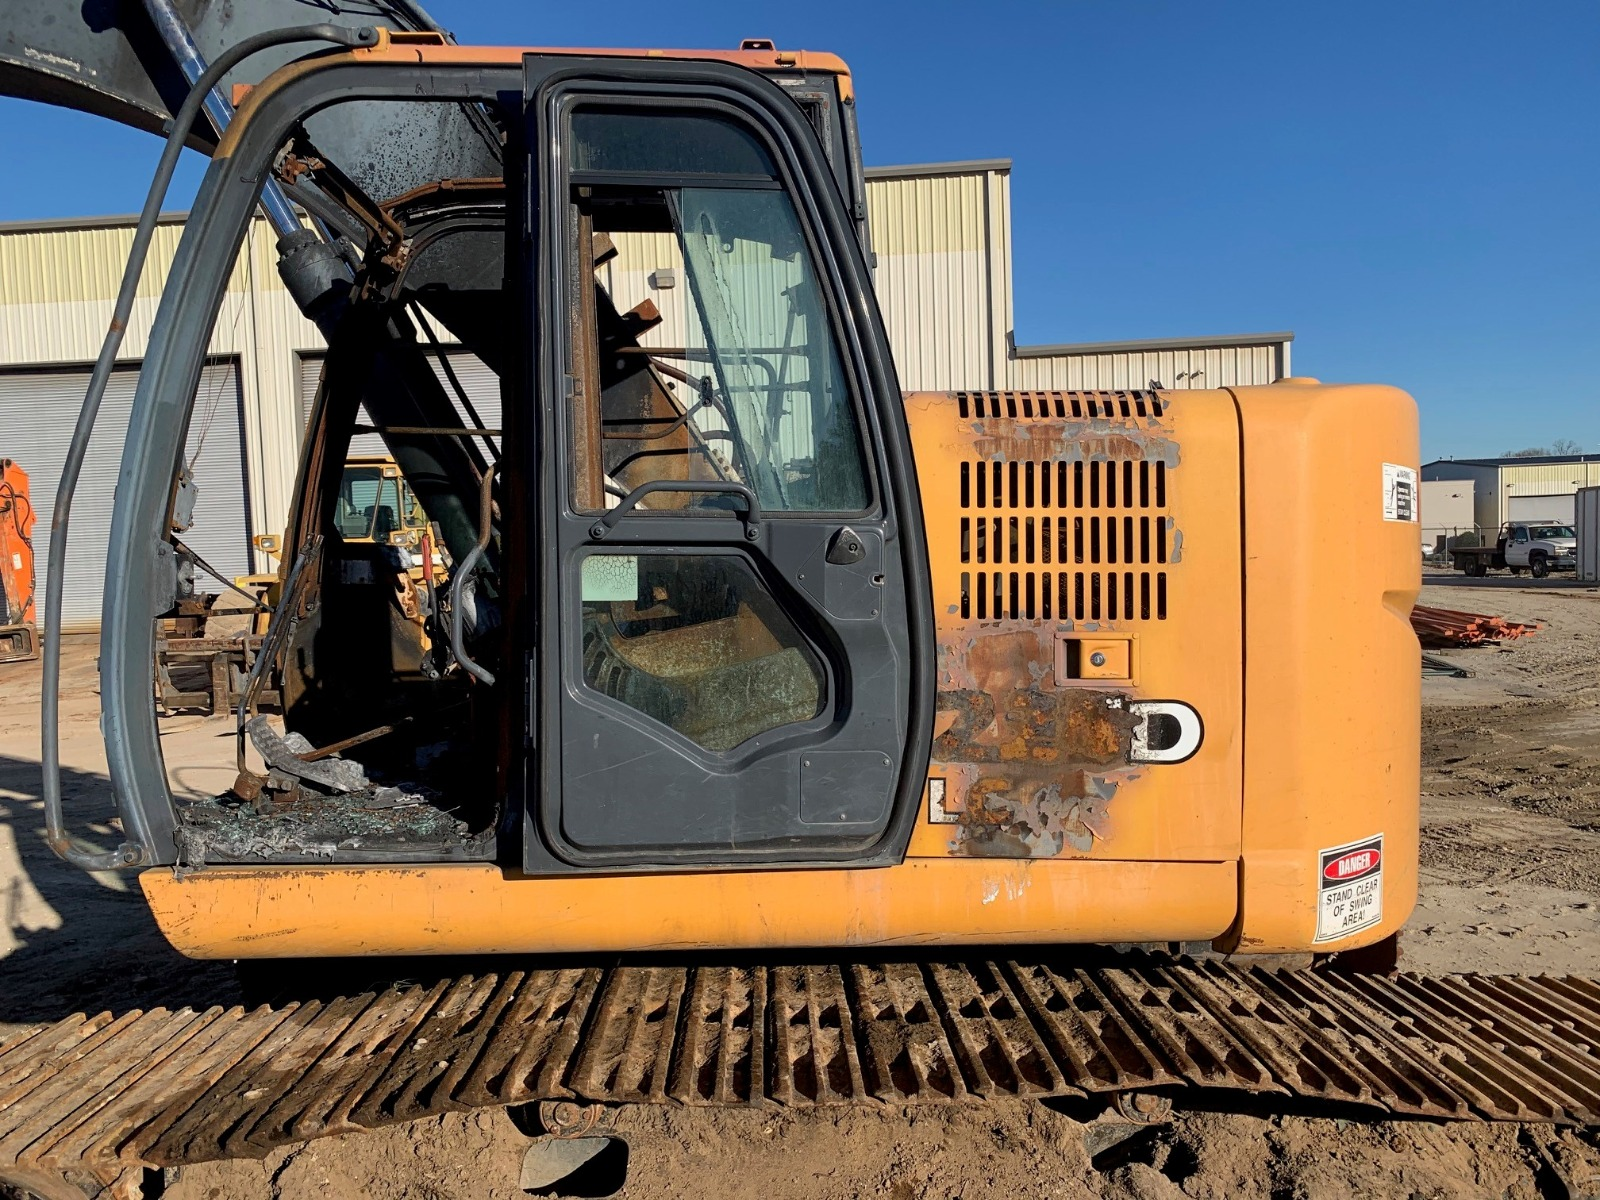 John Deere 225D LC salvaged machine photo 7